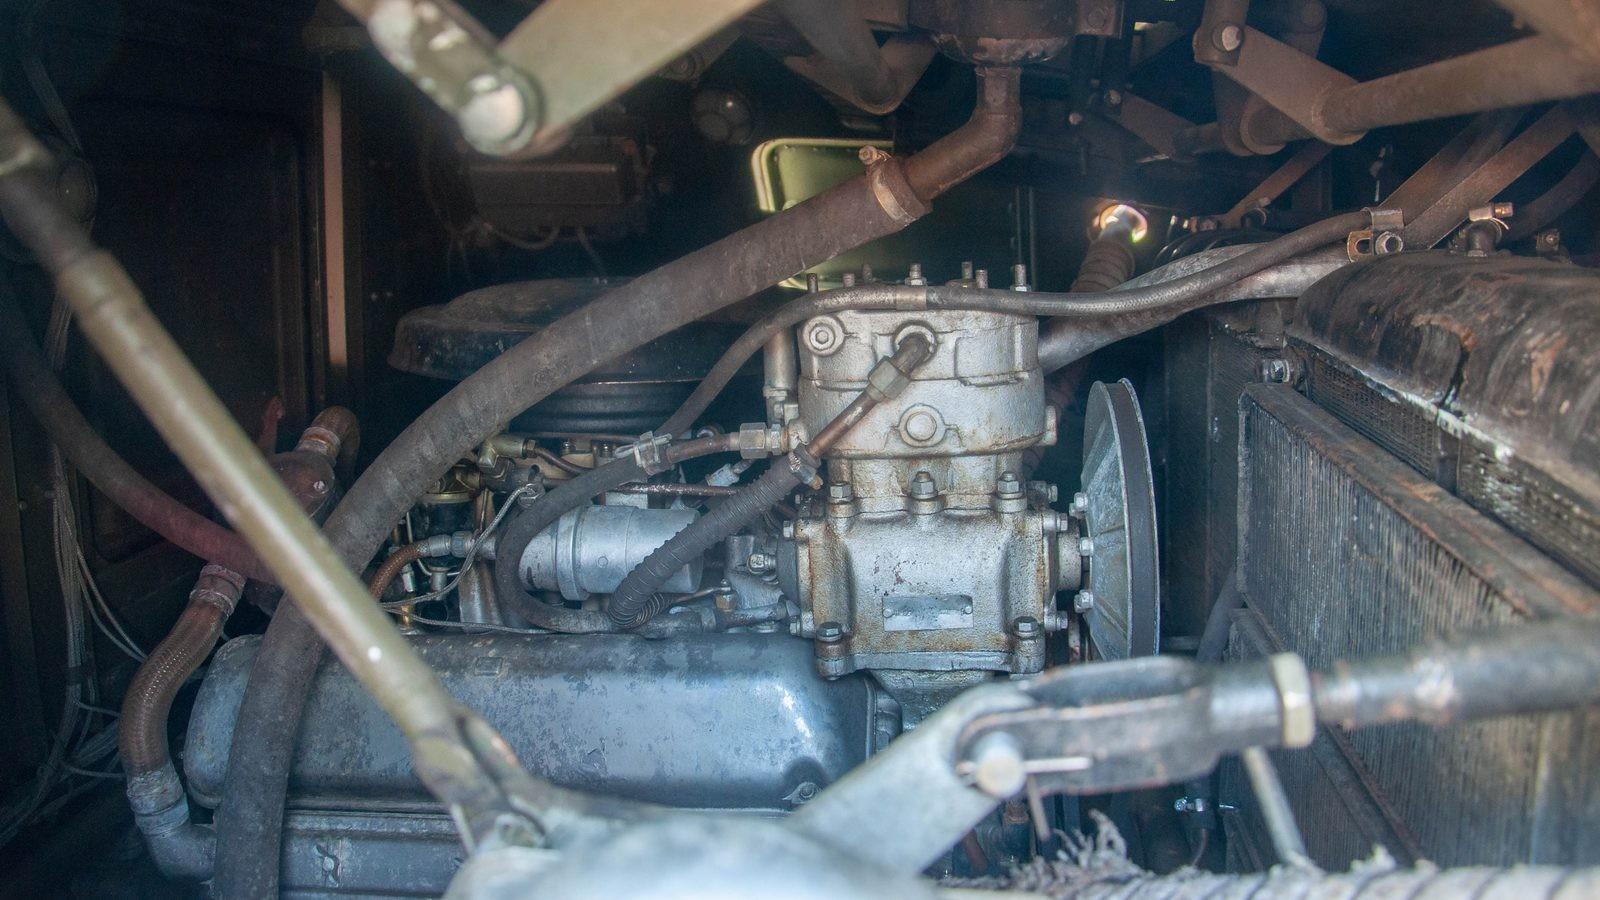 БРДМ-2 РХ двигатель